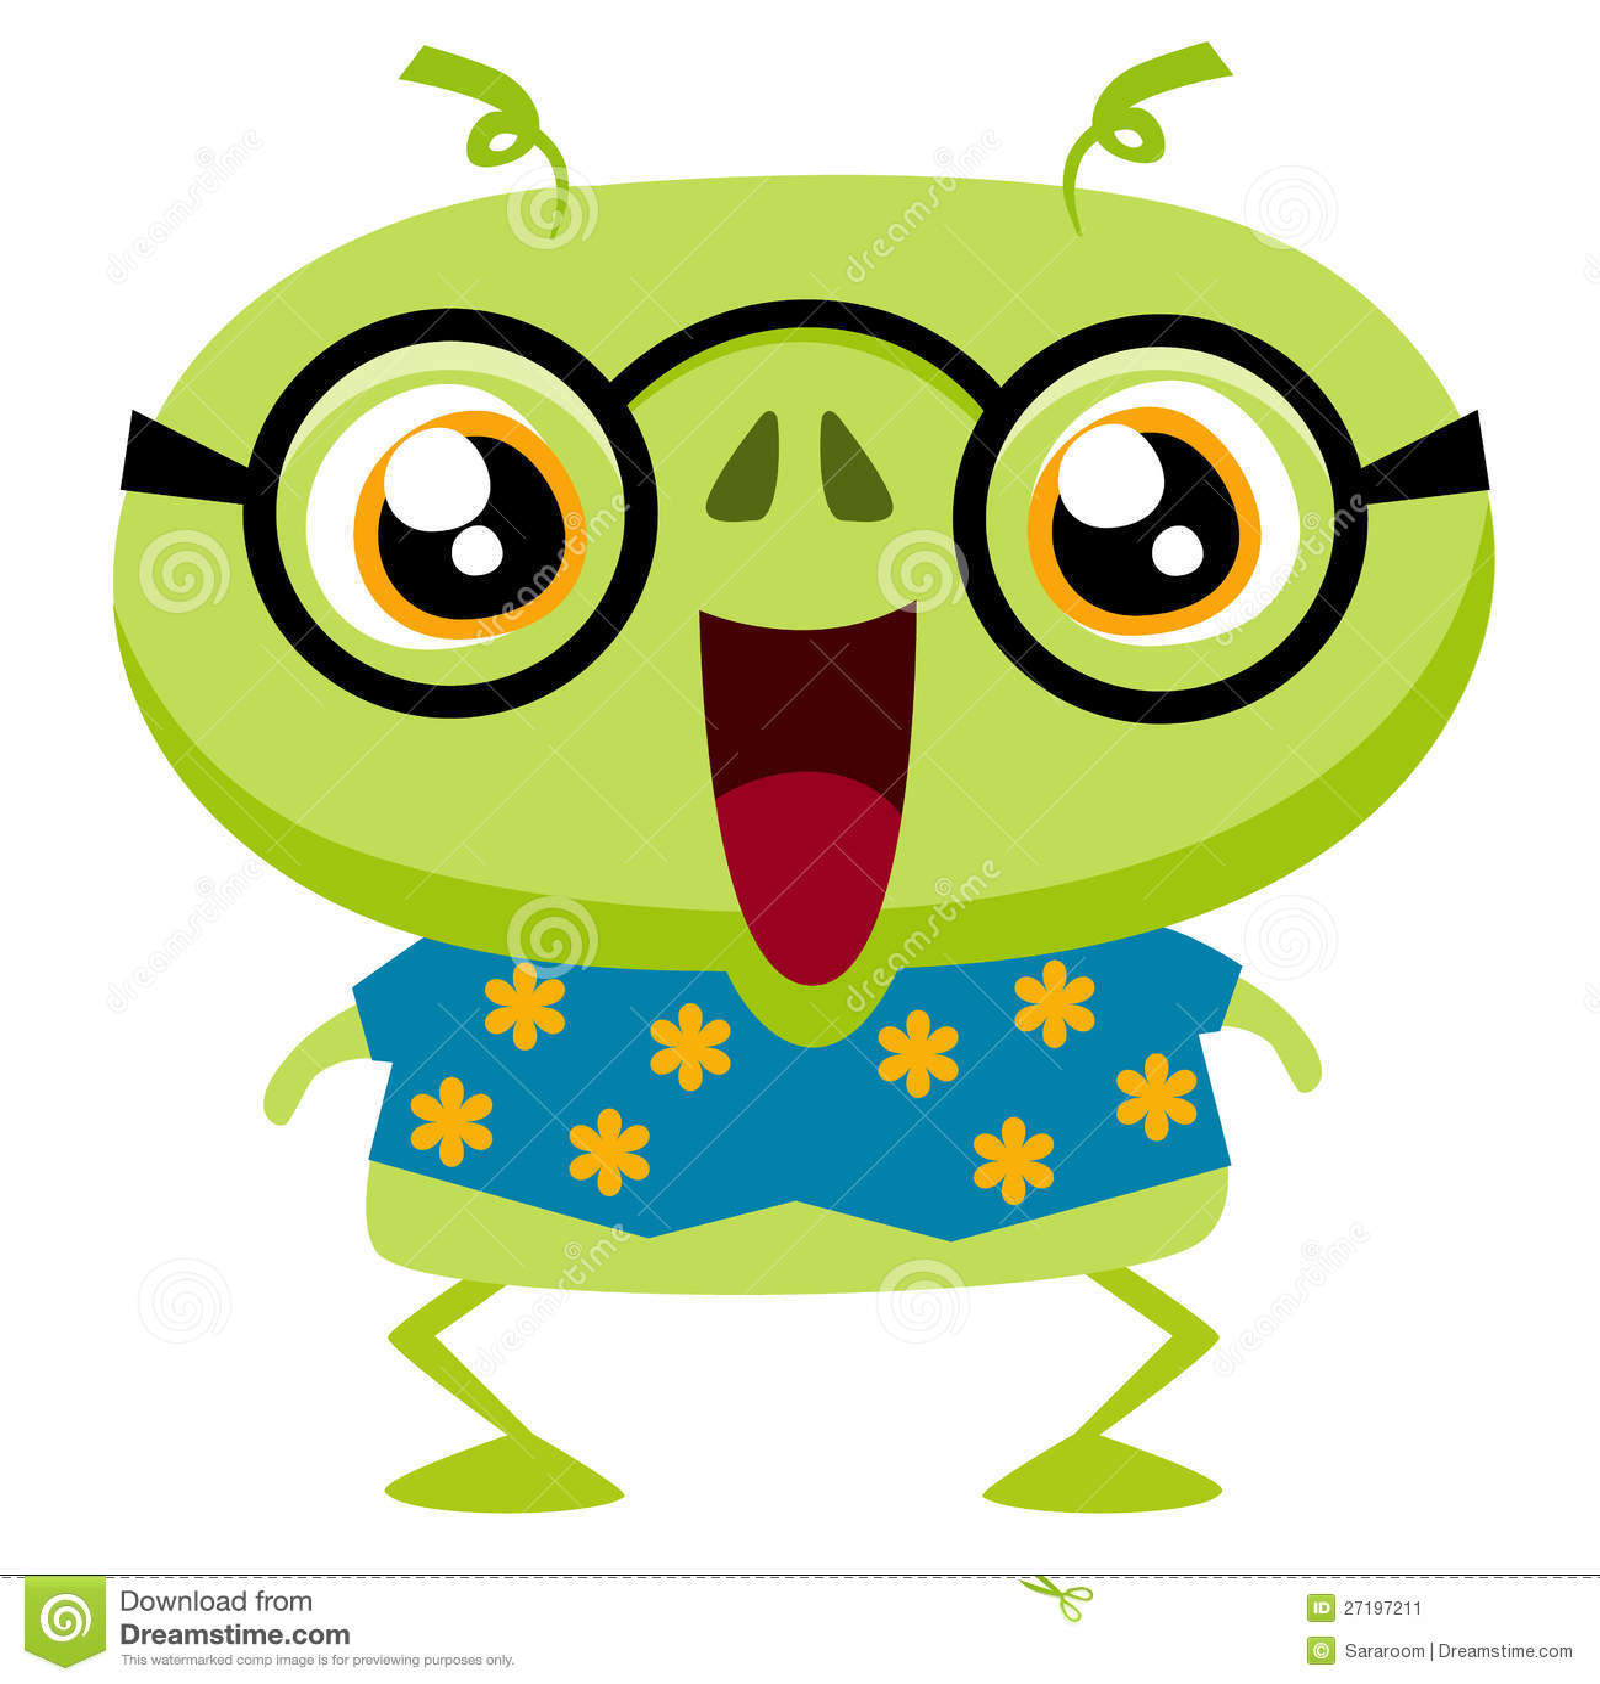 Cute Cartoon Monster Stock Image - Image: 27197211